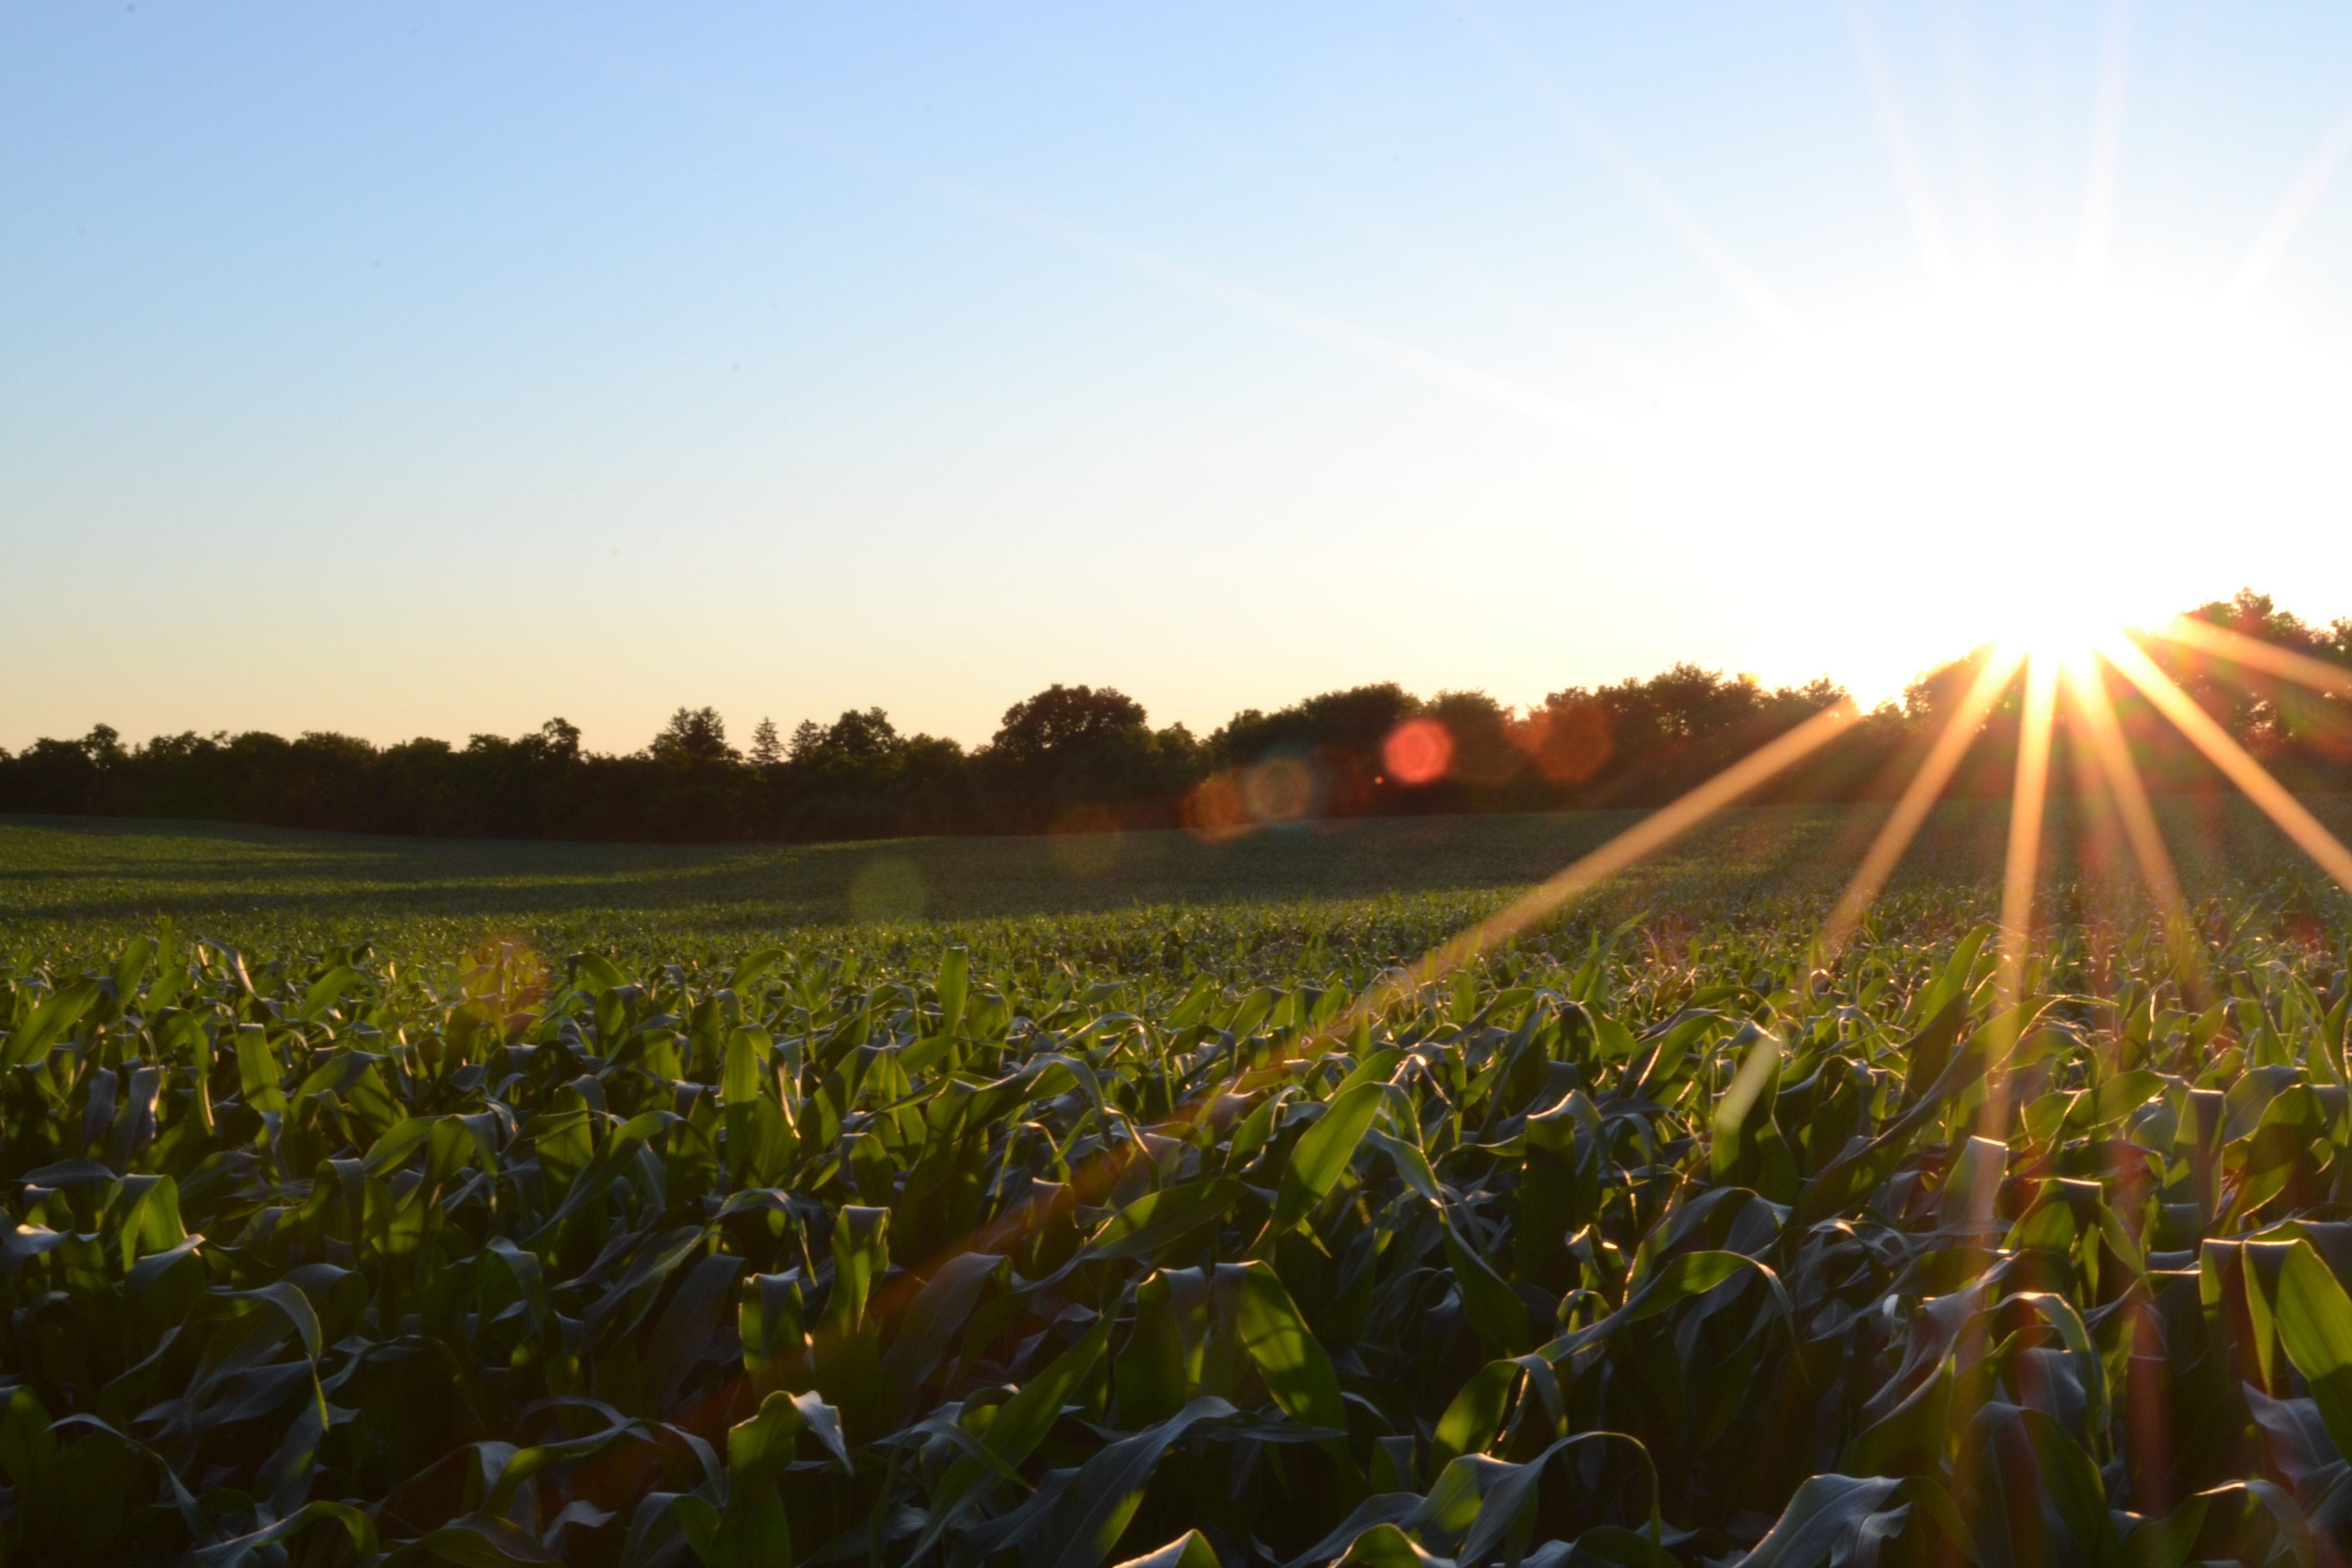 Rays of sunlight photo